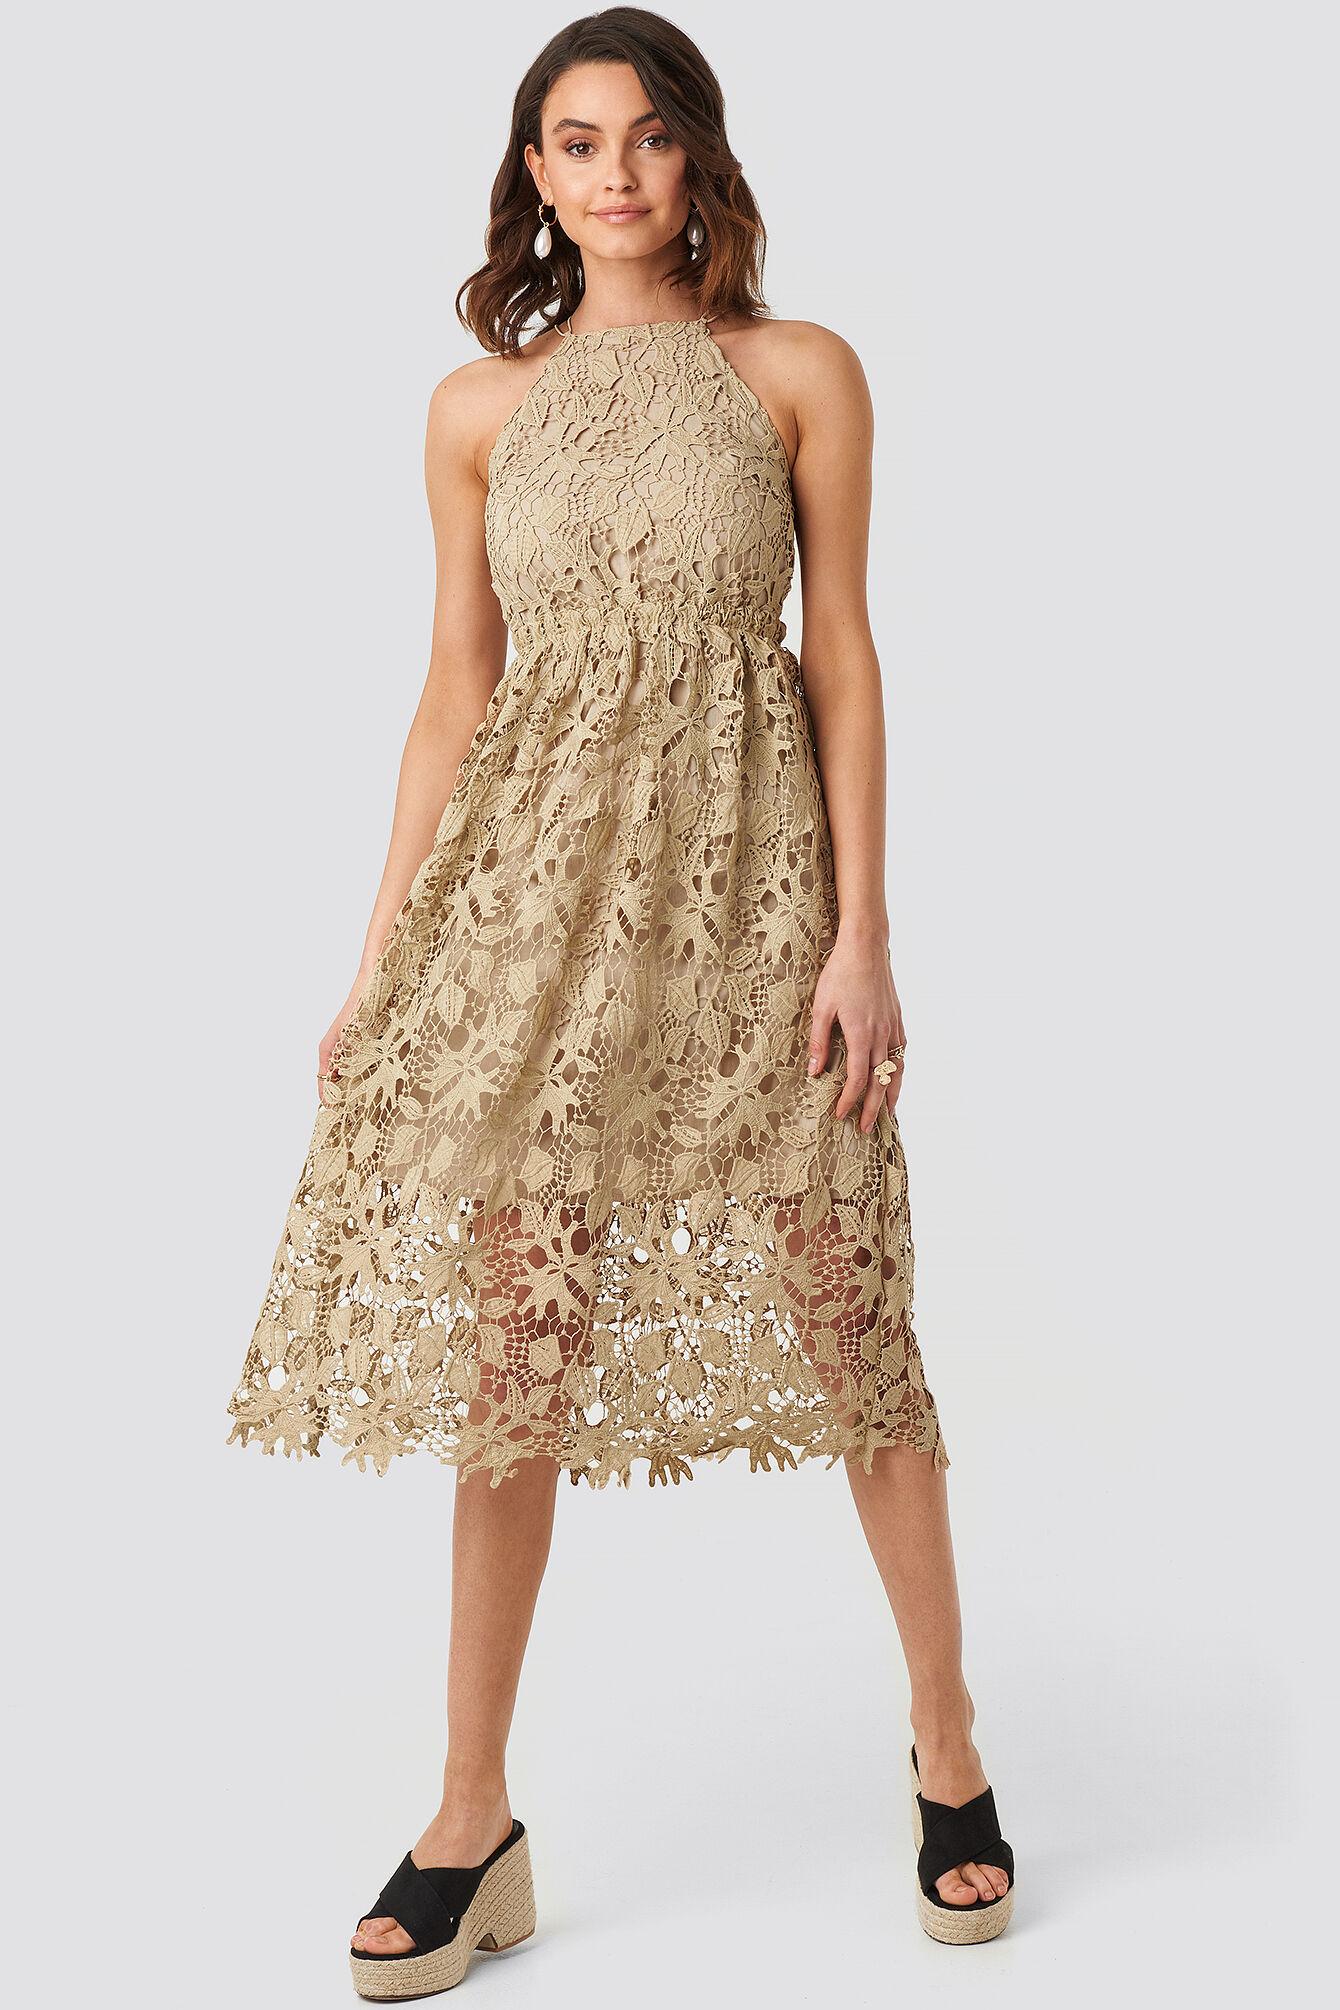 Image of NA-KD Boho Crochet Strap Back Dress - Beige